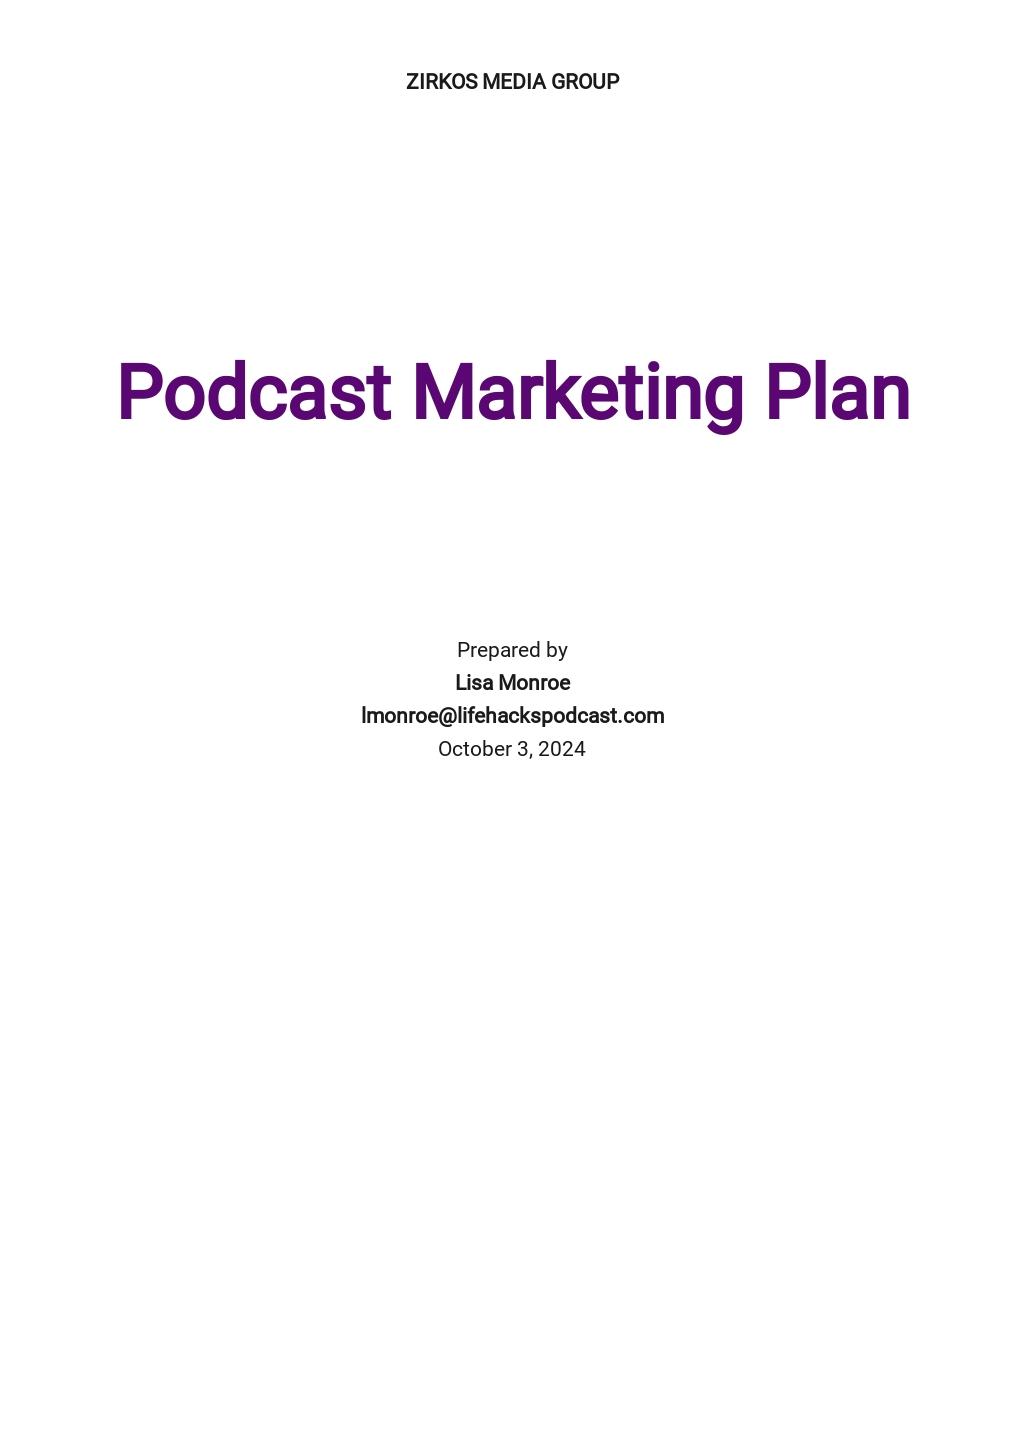 Podcast Marketing Plan Template